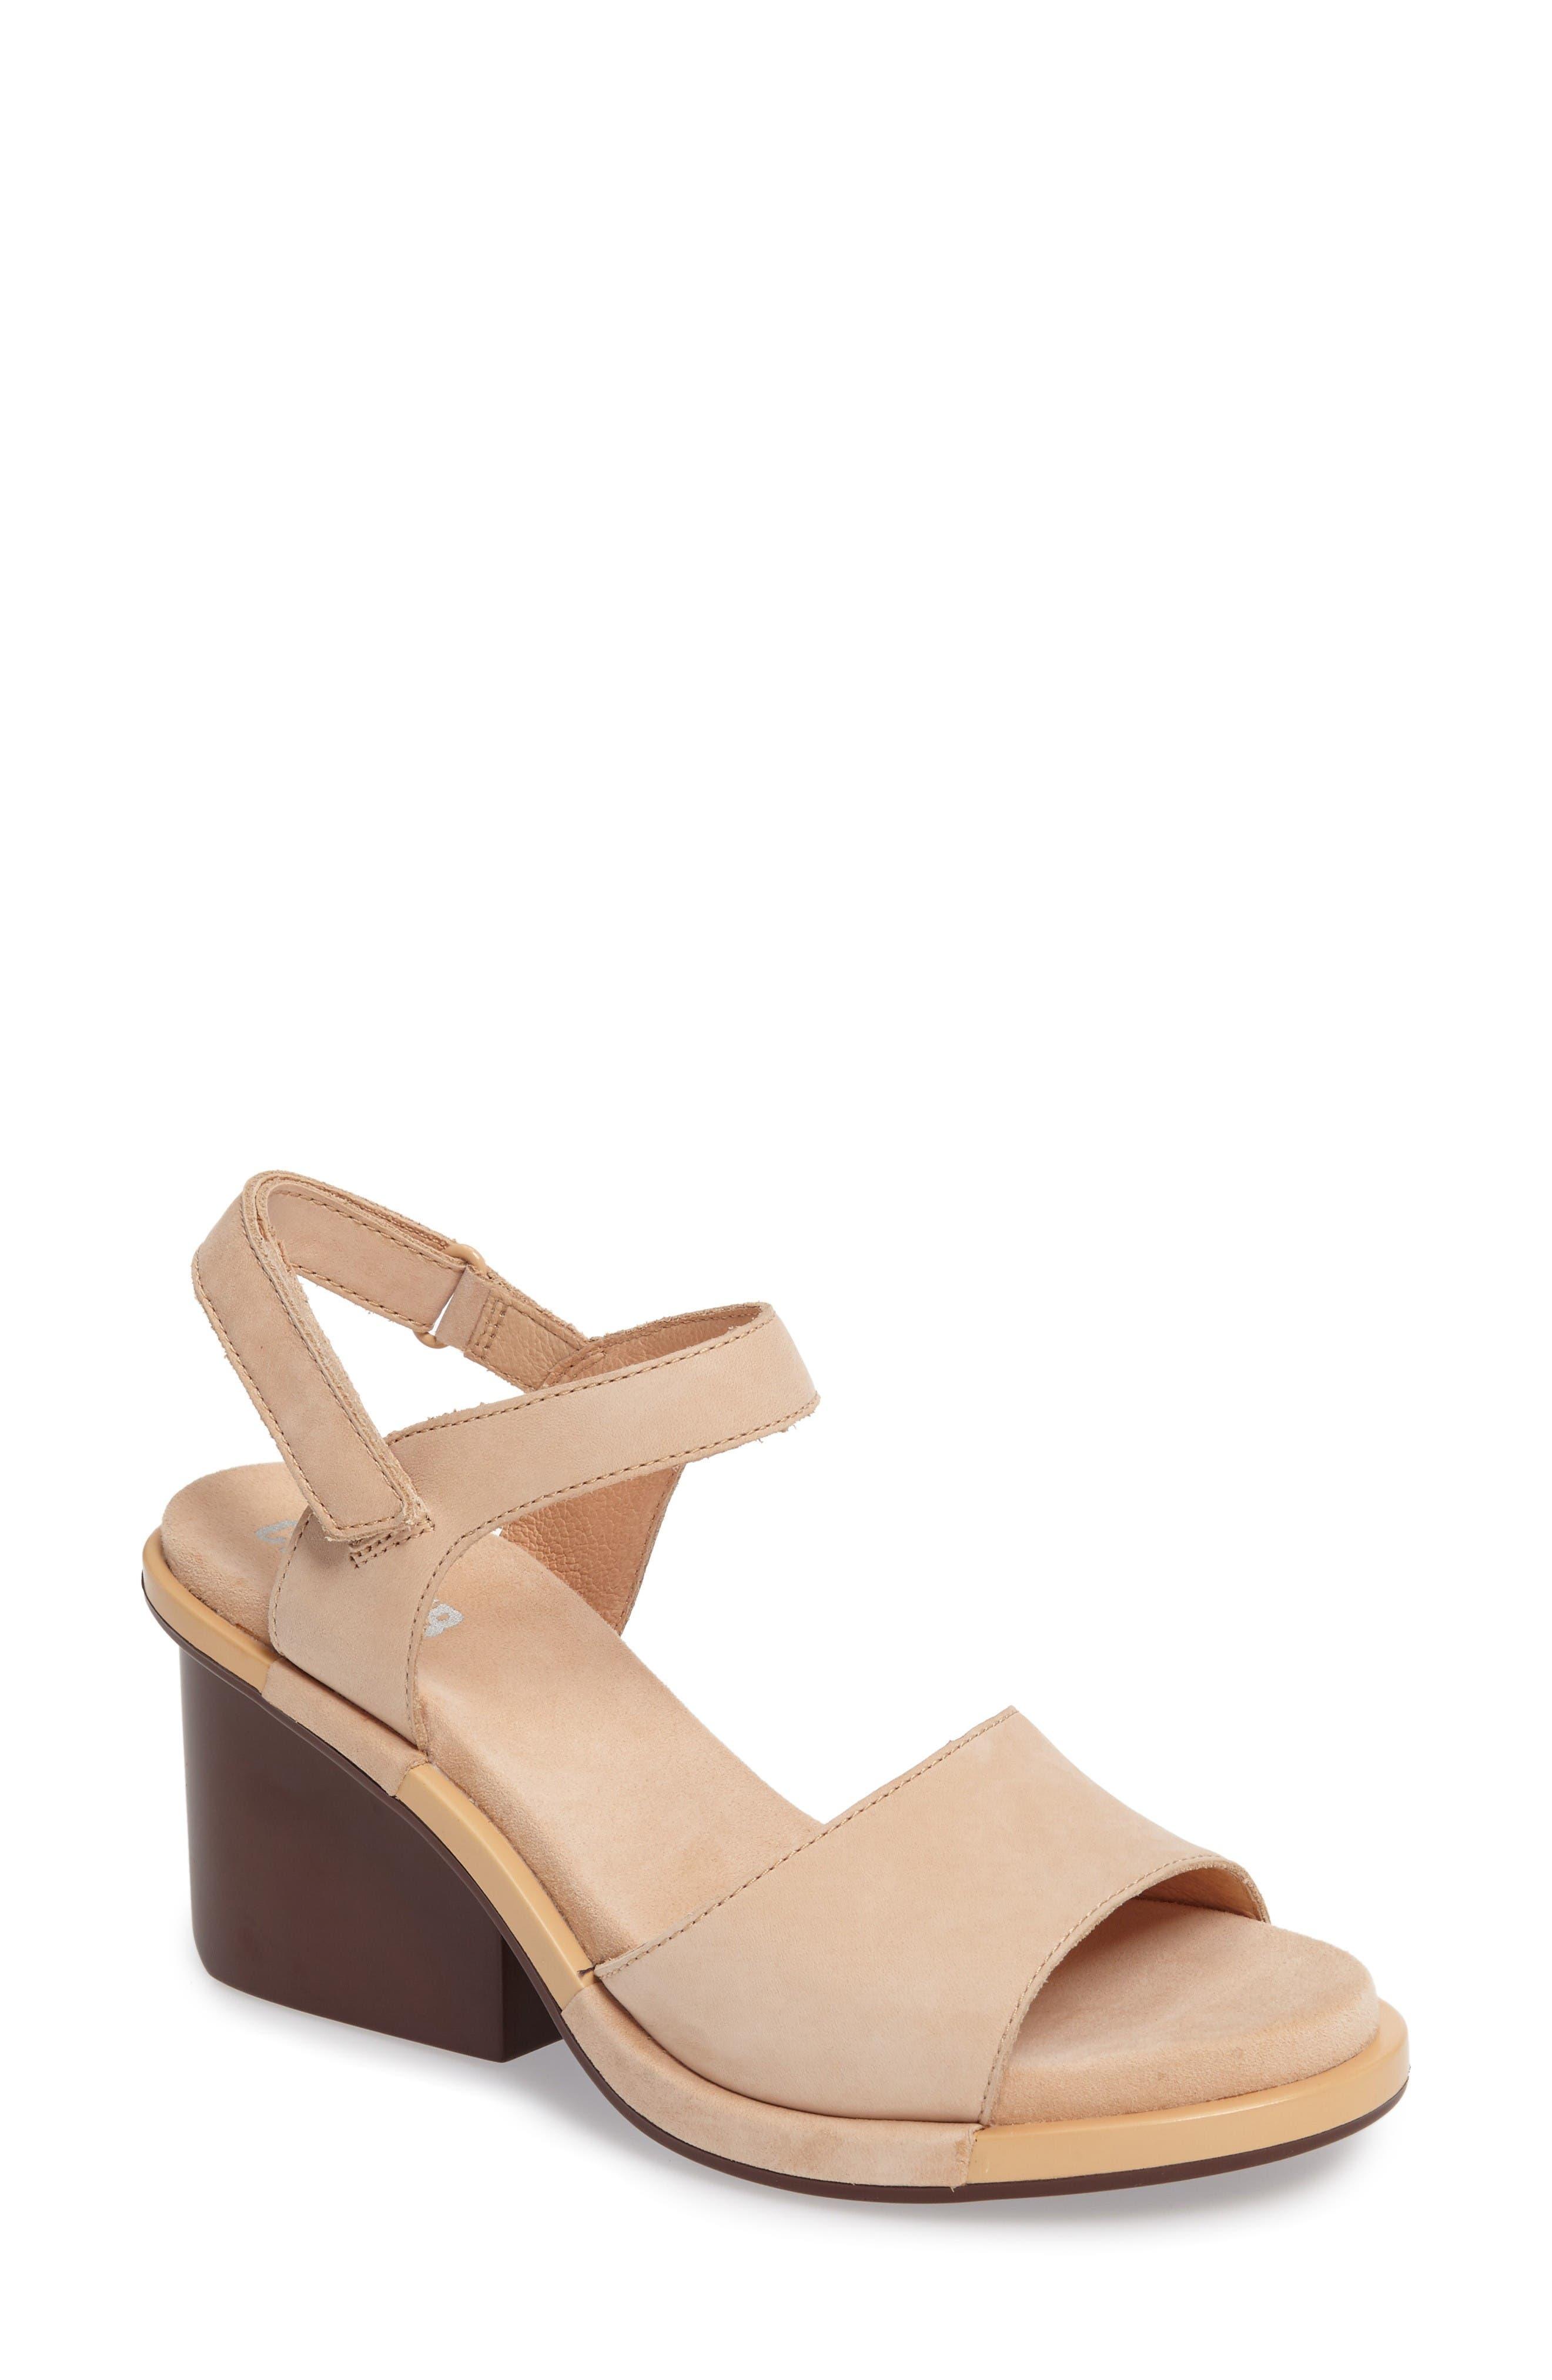 Ivy Ankle Strap Sandal,                             Main thumbnail 1, color,                             Beige Leather